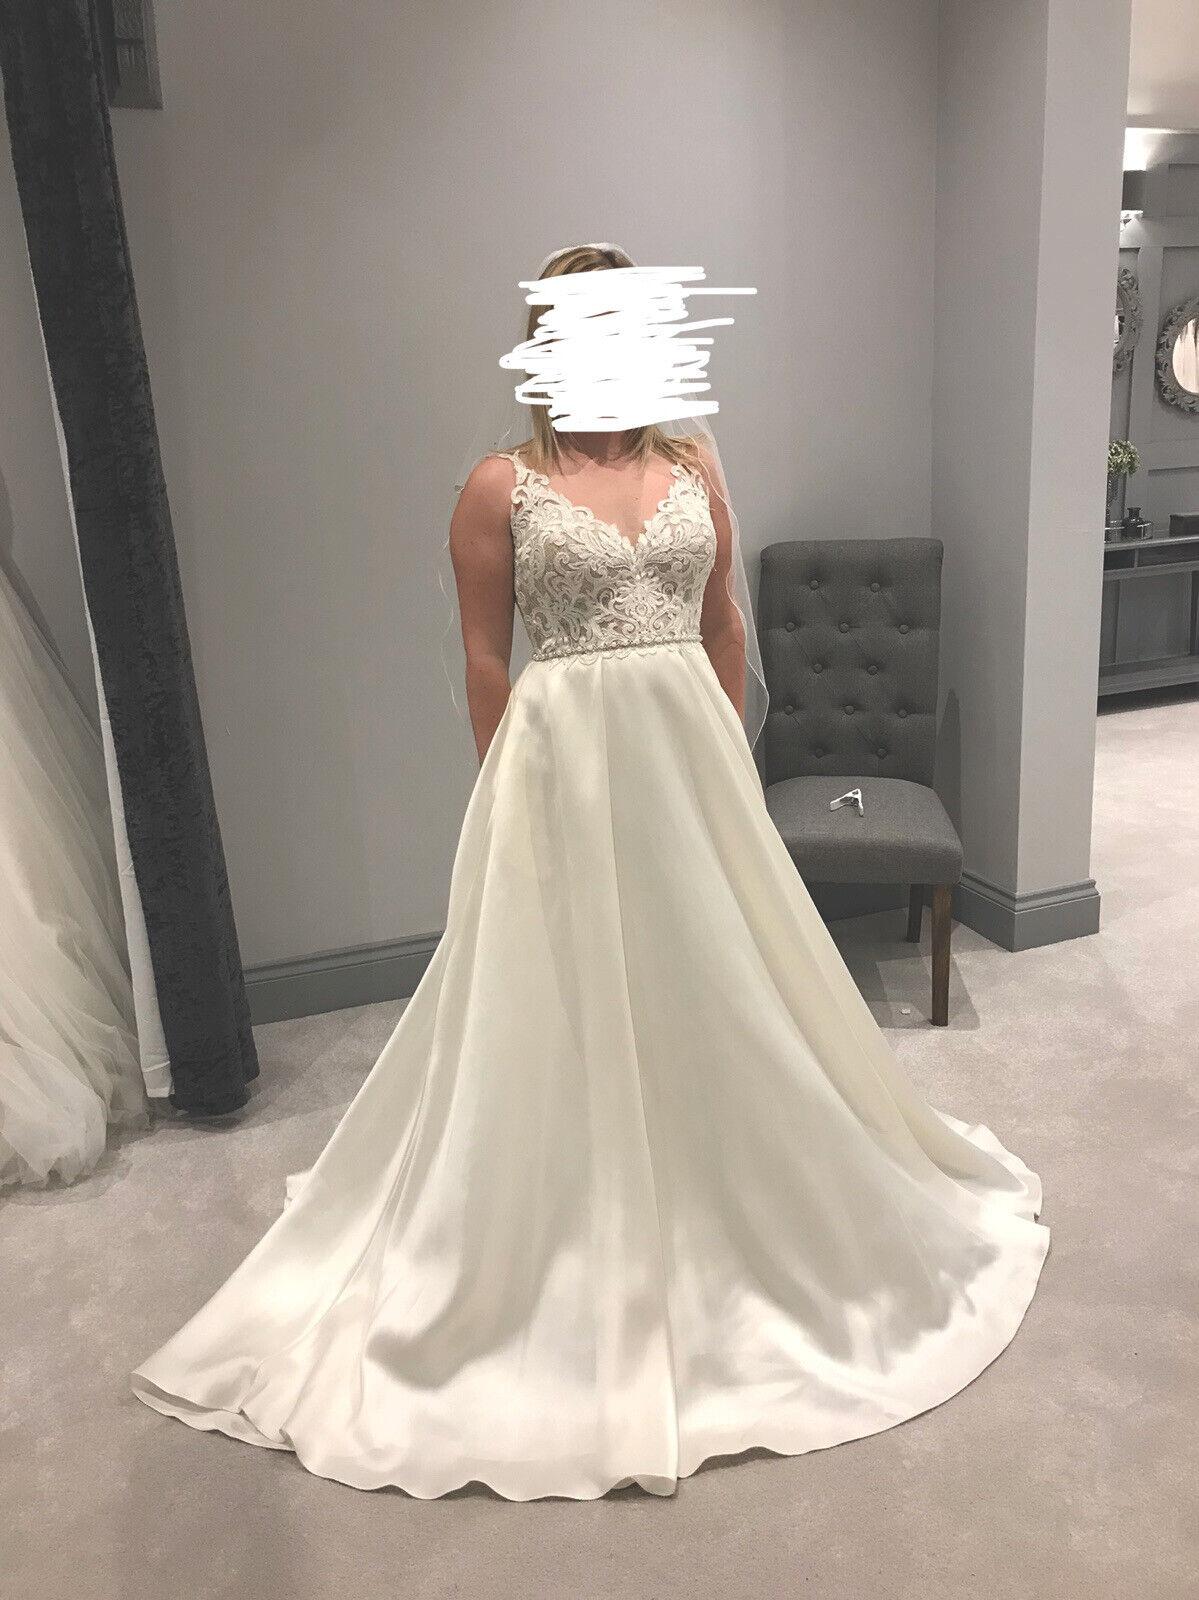 stella york wedding dress size 14